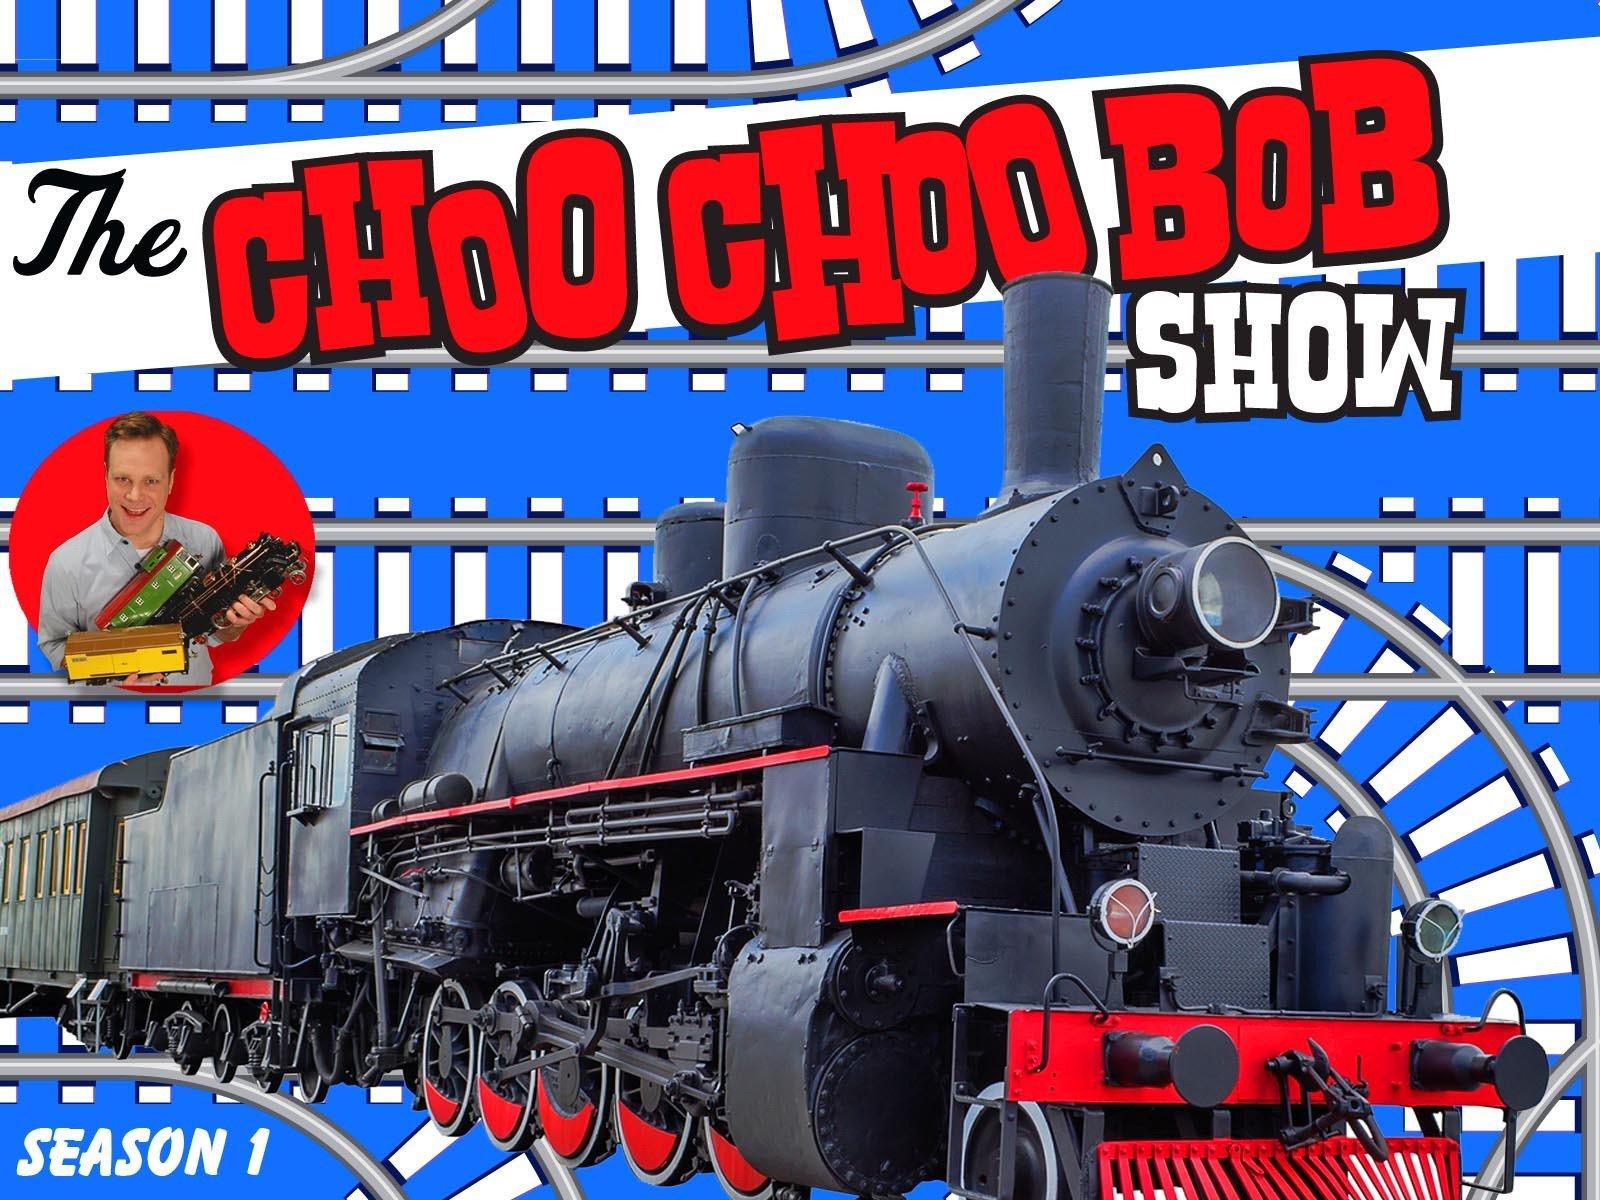 The Choo Choo Bob Show - Season 1